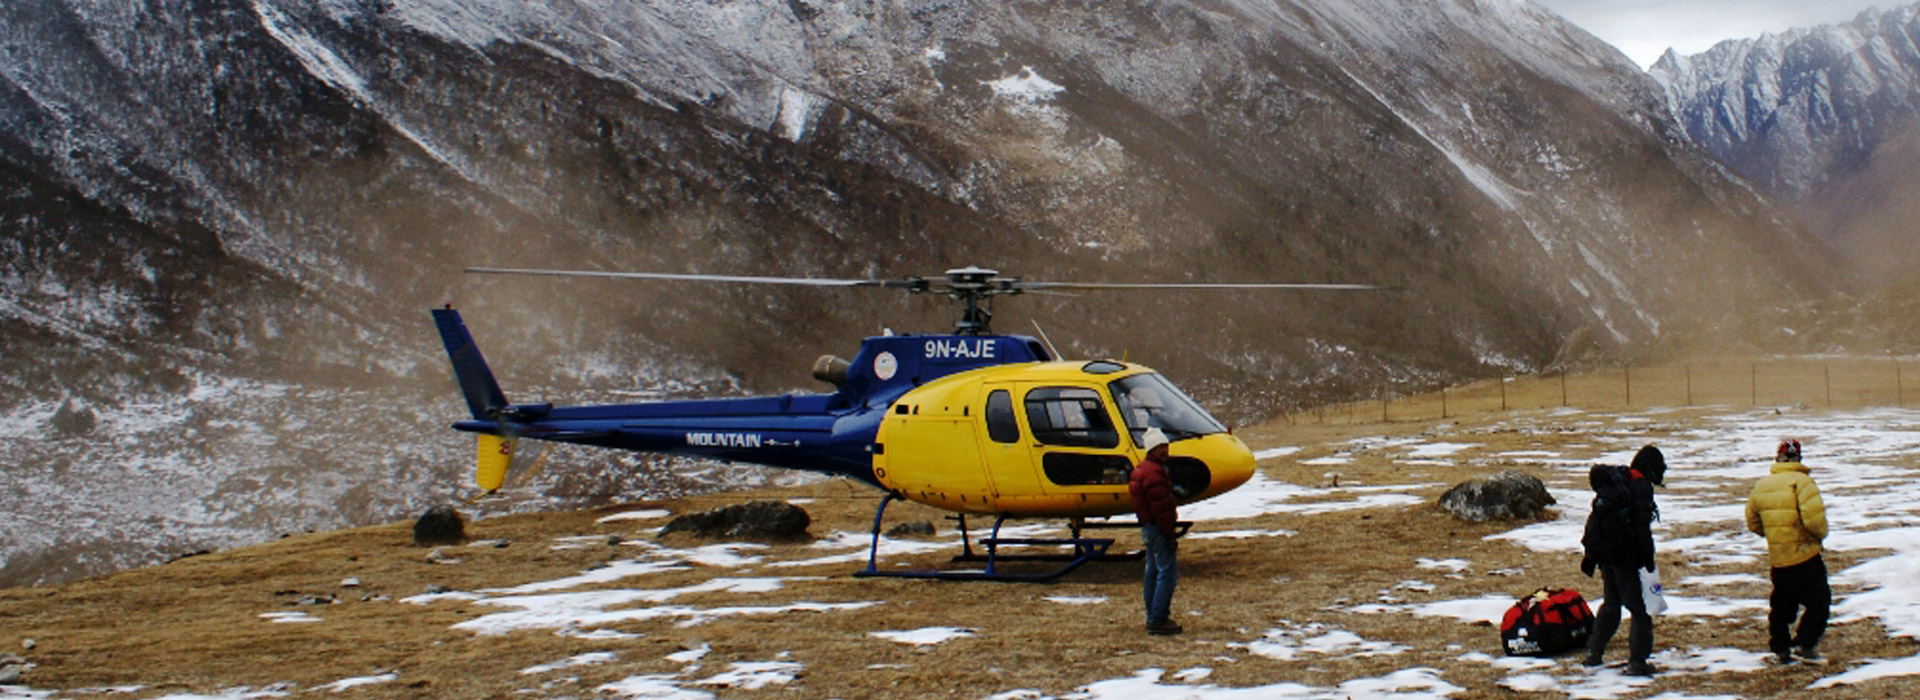 Langtang Trekking with Heli Return